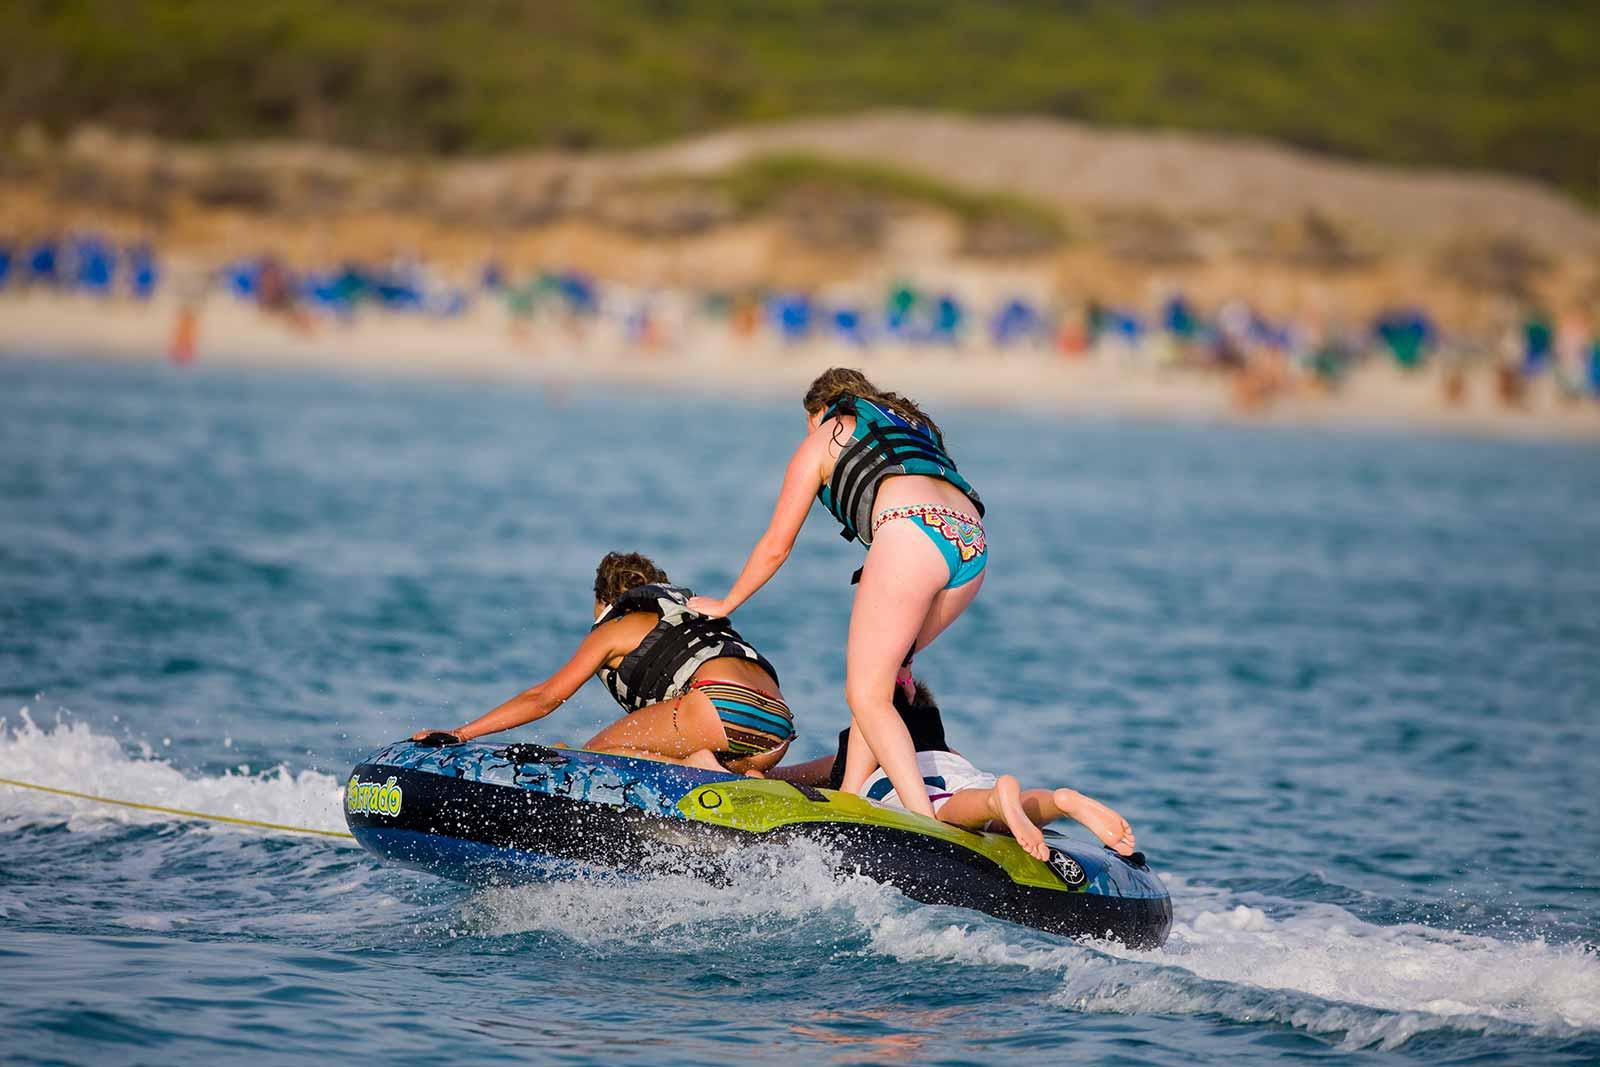 RIB-Boot-mieten-Mallorca-Wassersport-Mallorca-1